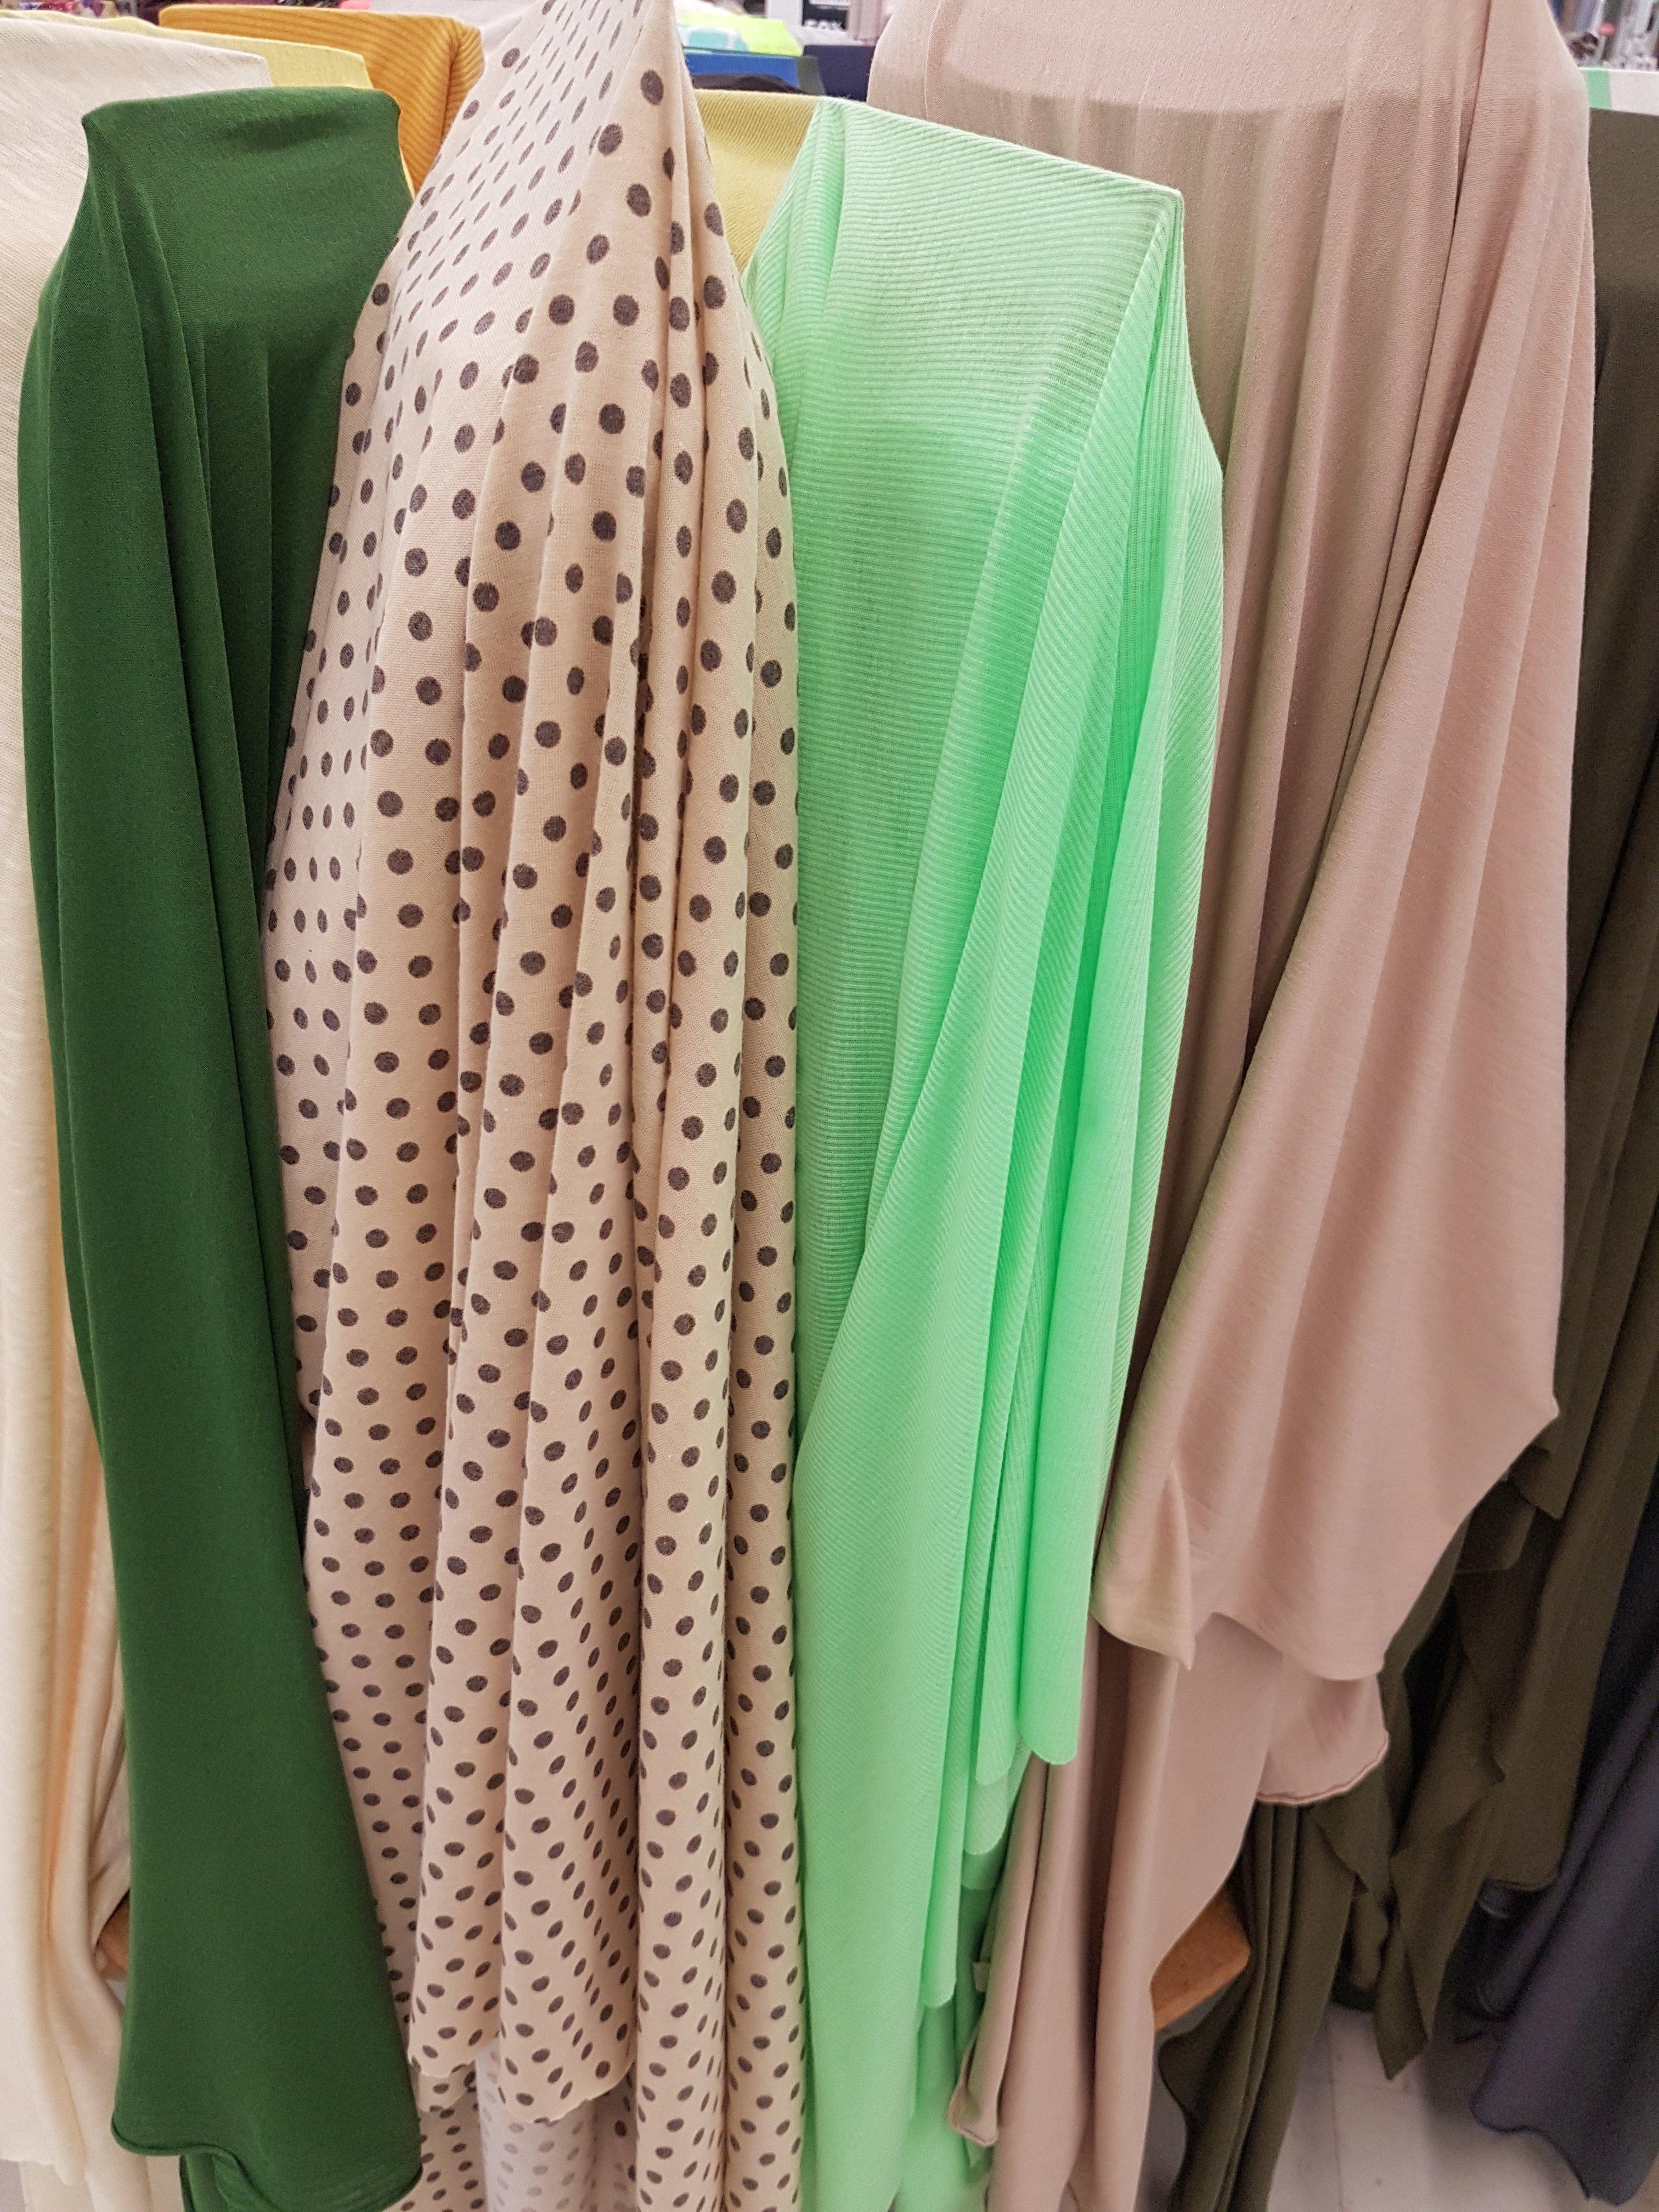 Bolts of knit fabrics